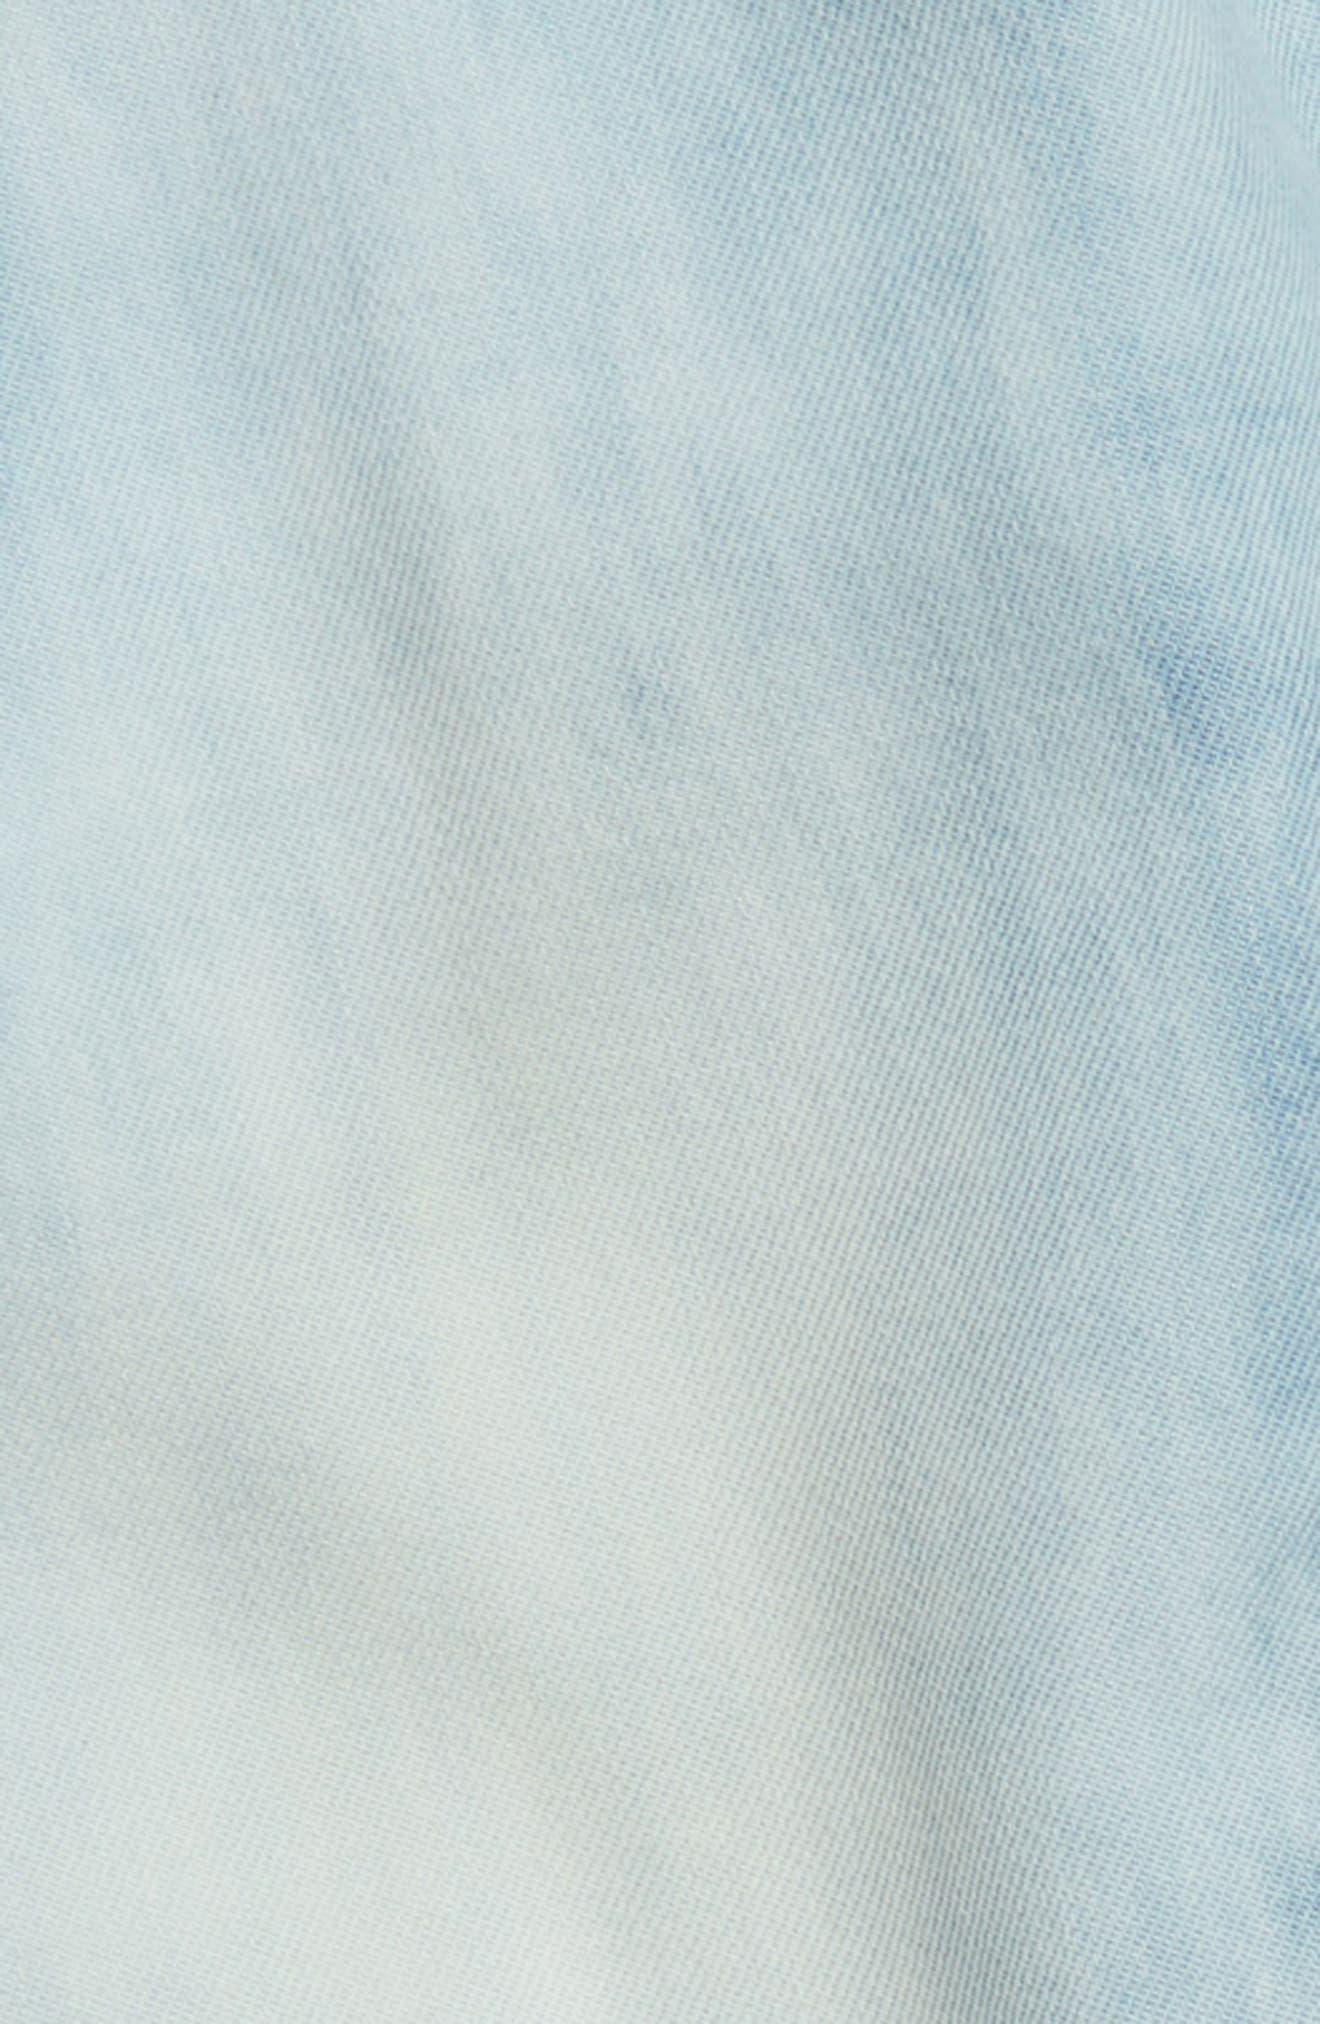 Denim Jogger Pants,                             Alternate thumbnail 3, color,                             450